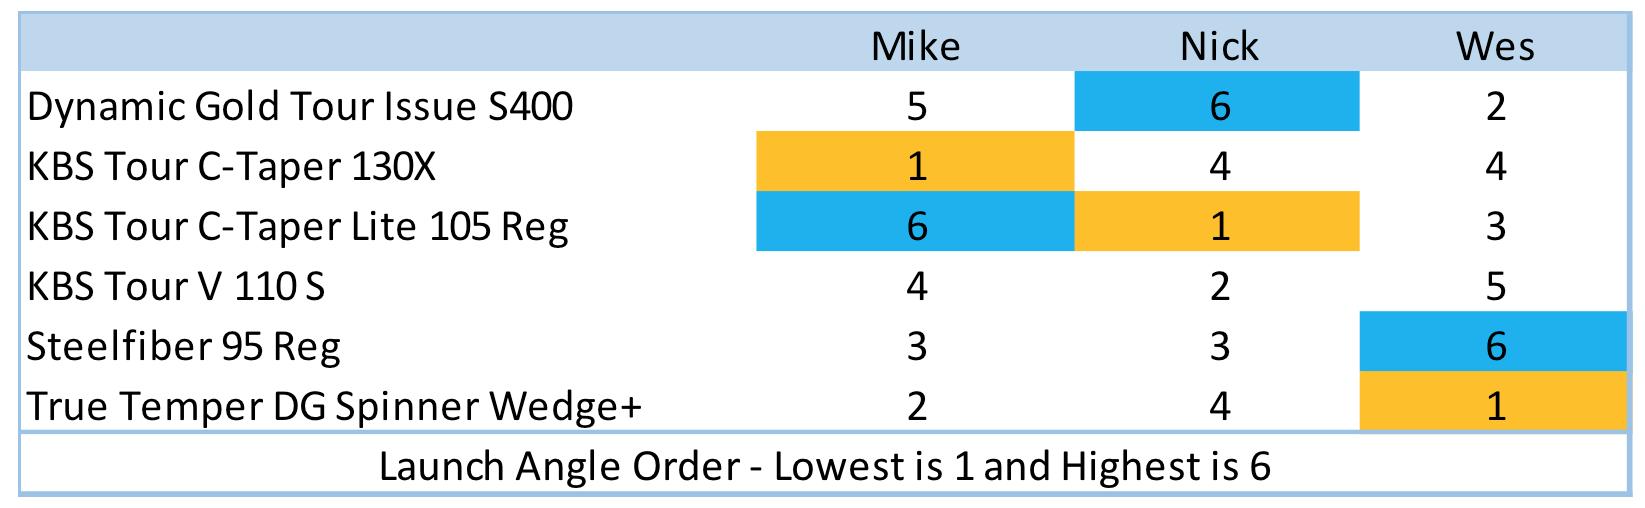 Wedge_Shaft_Launch_Angle